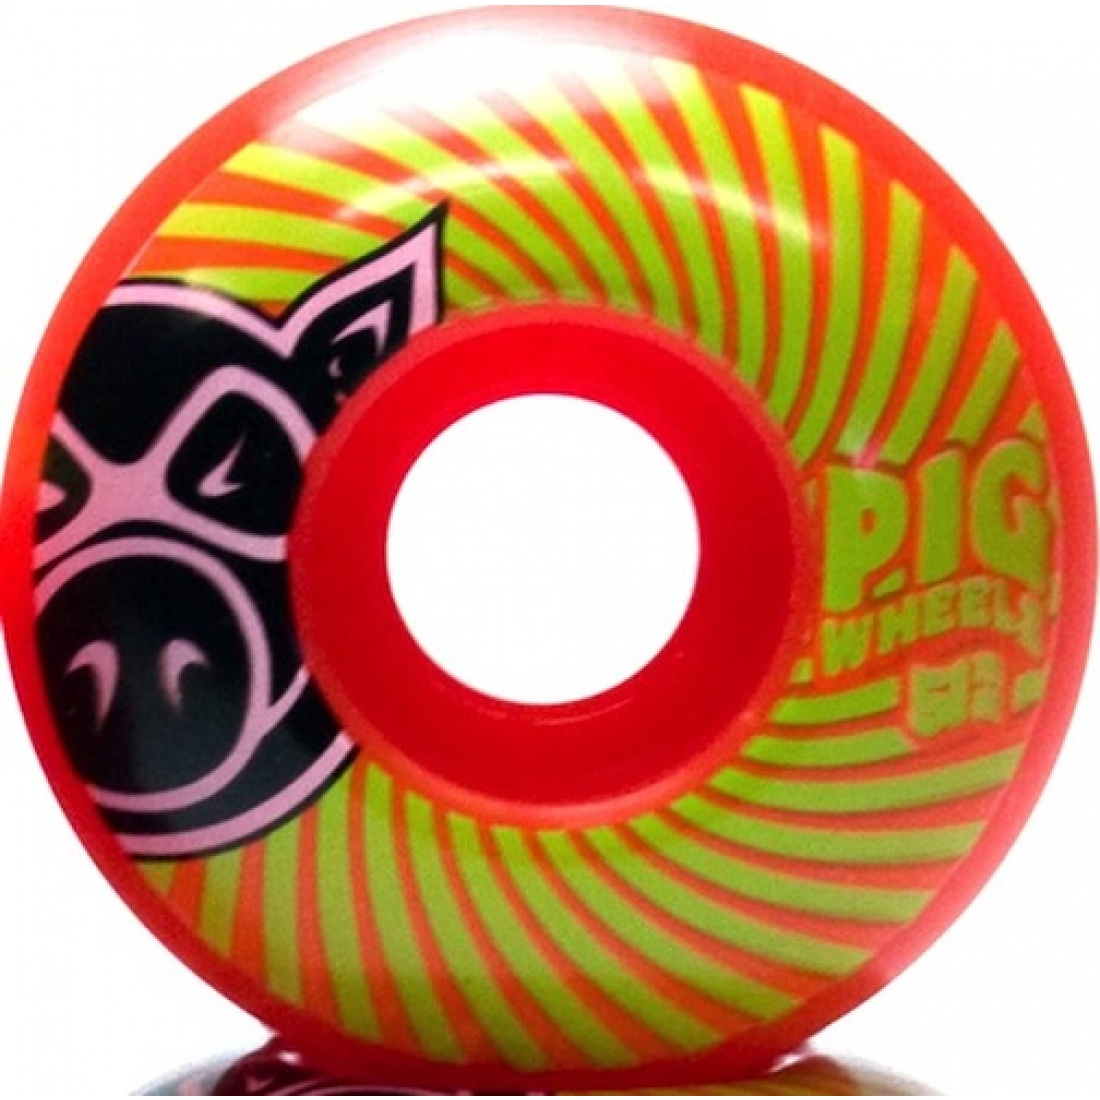 PIG-Hypno 51MM Wheels (Set of 4)